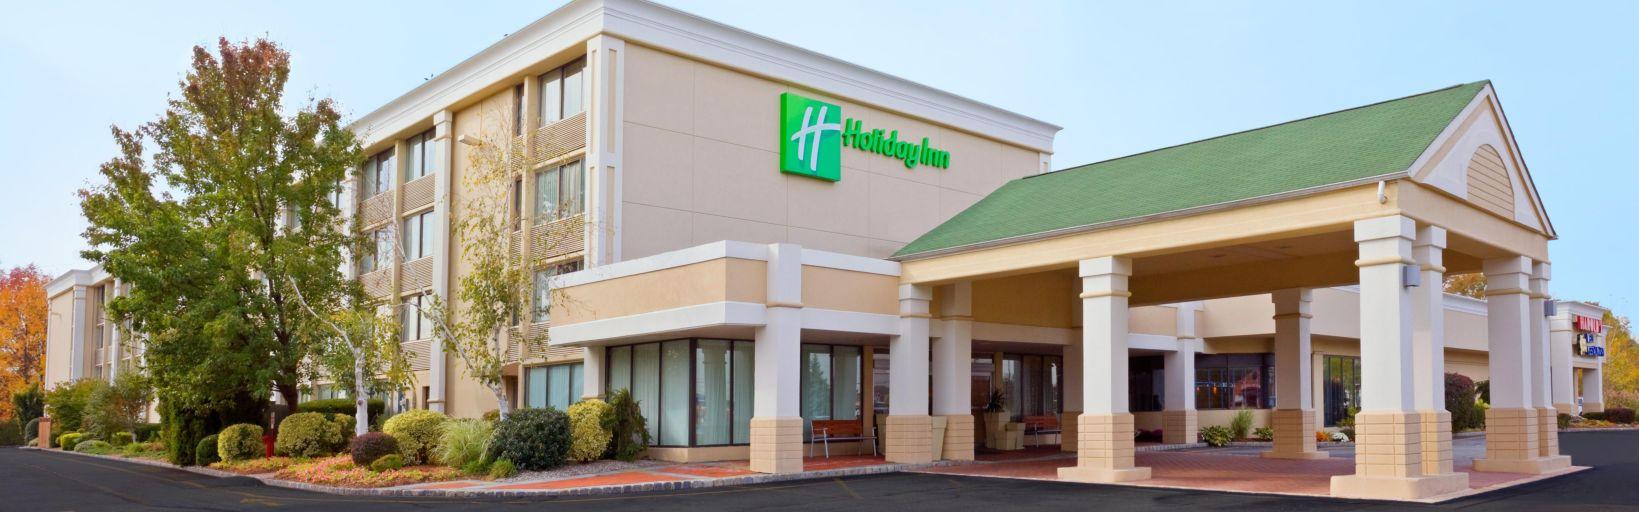 Hotels Near Freehold Nj